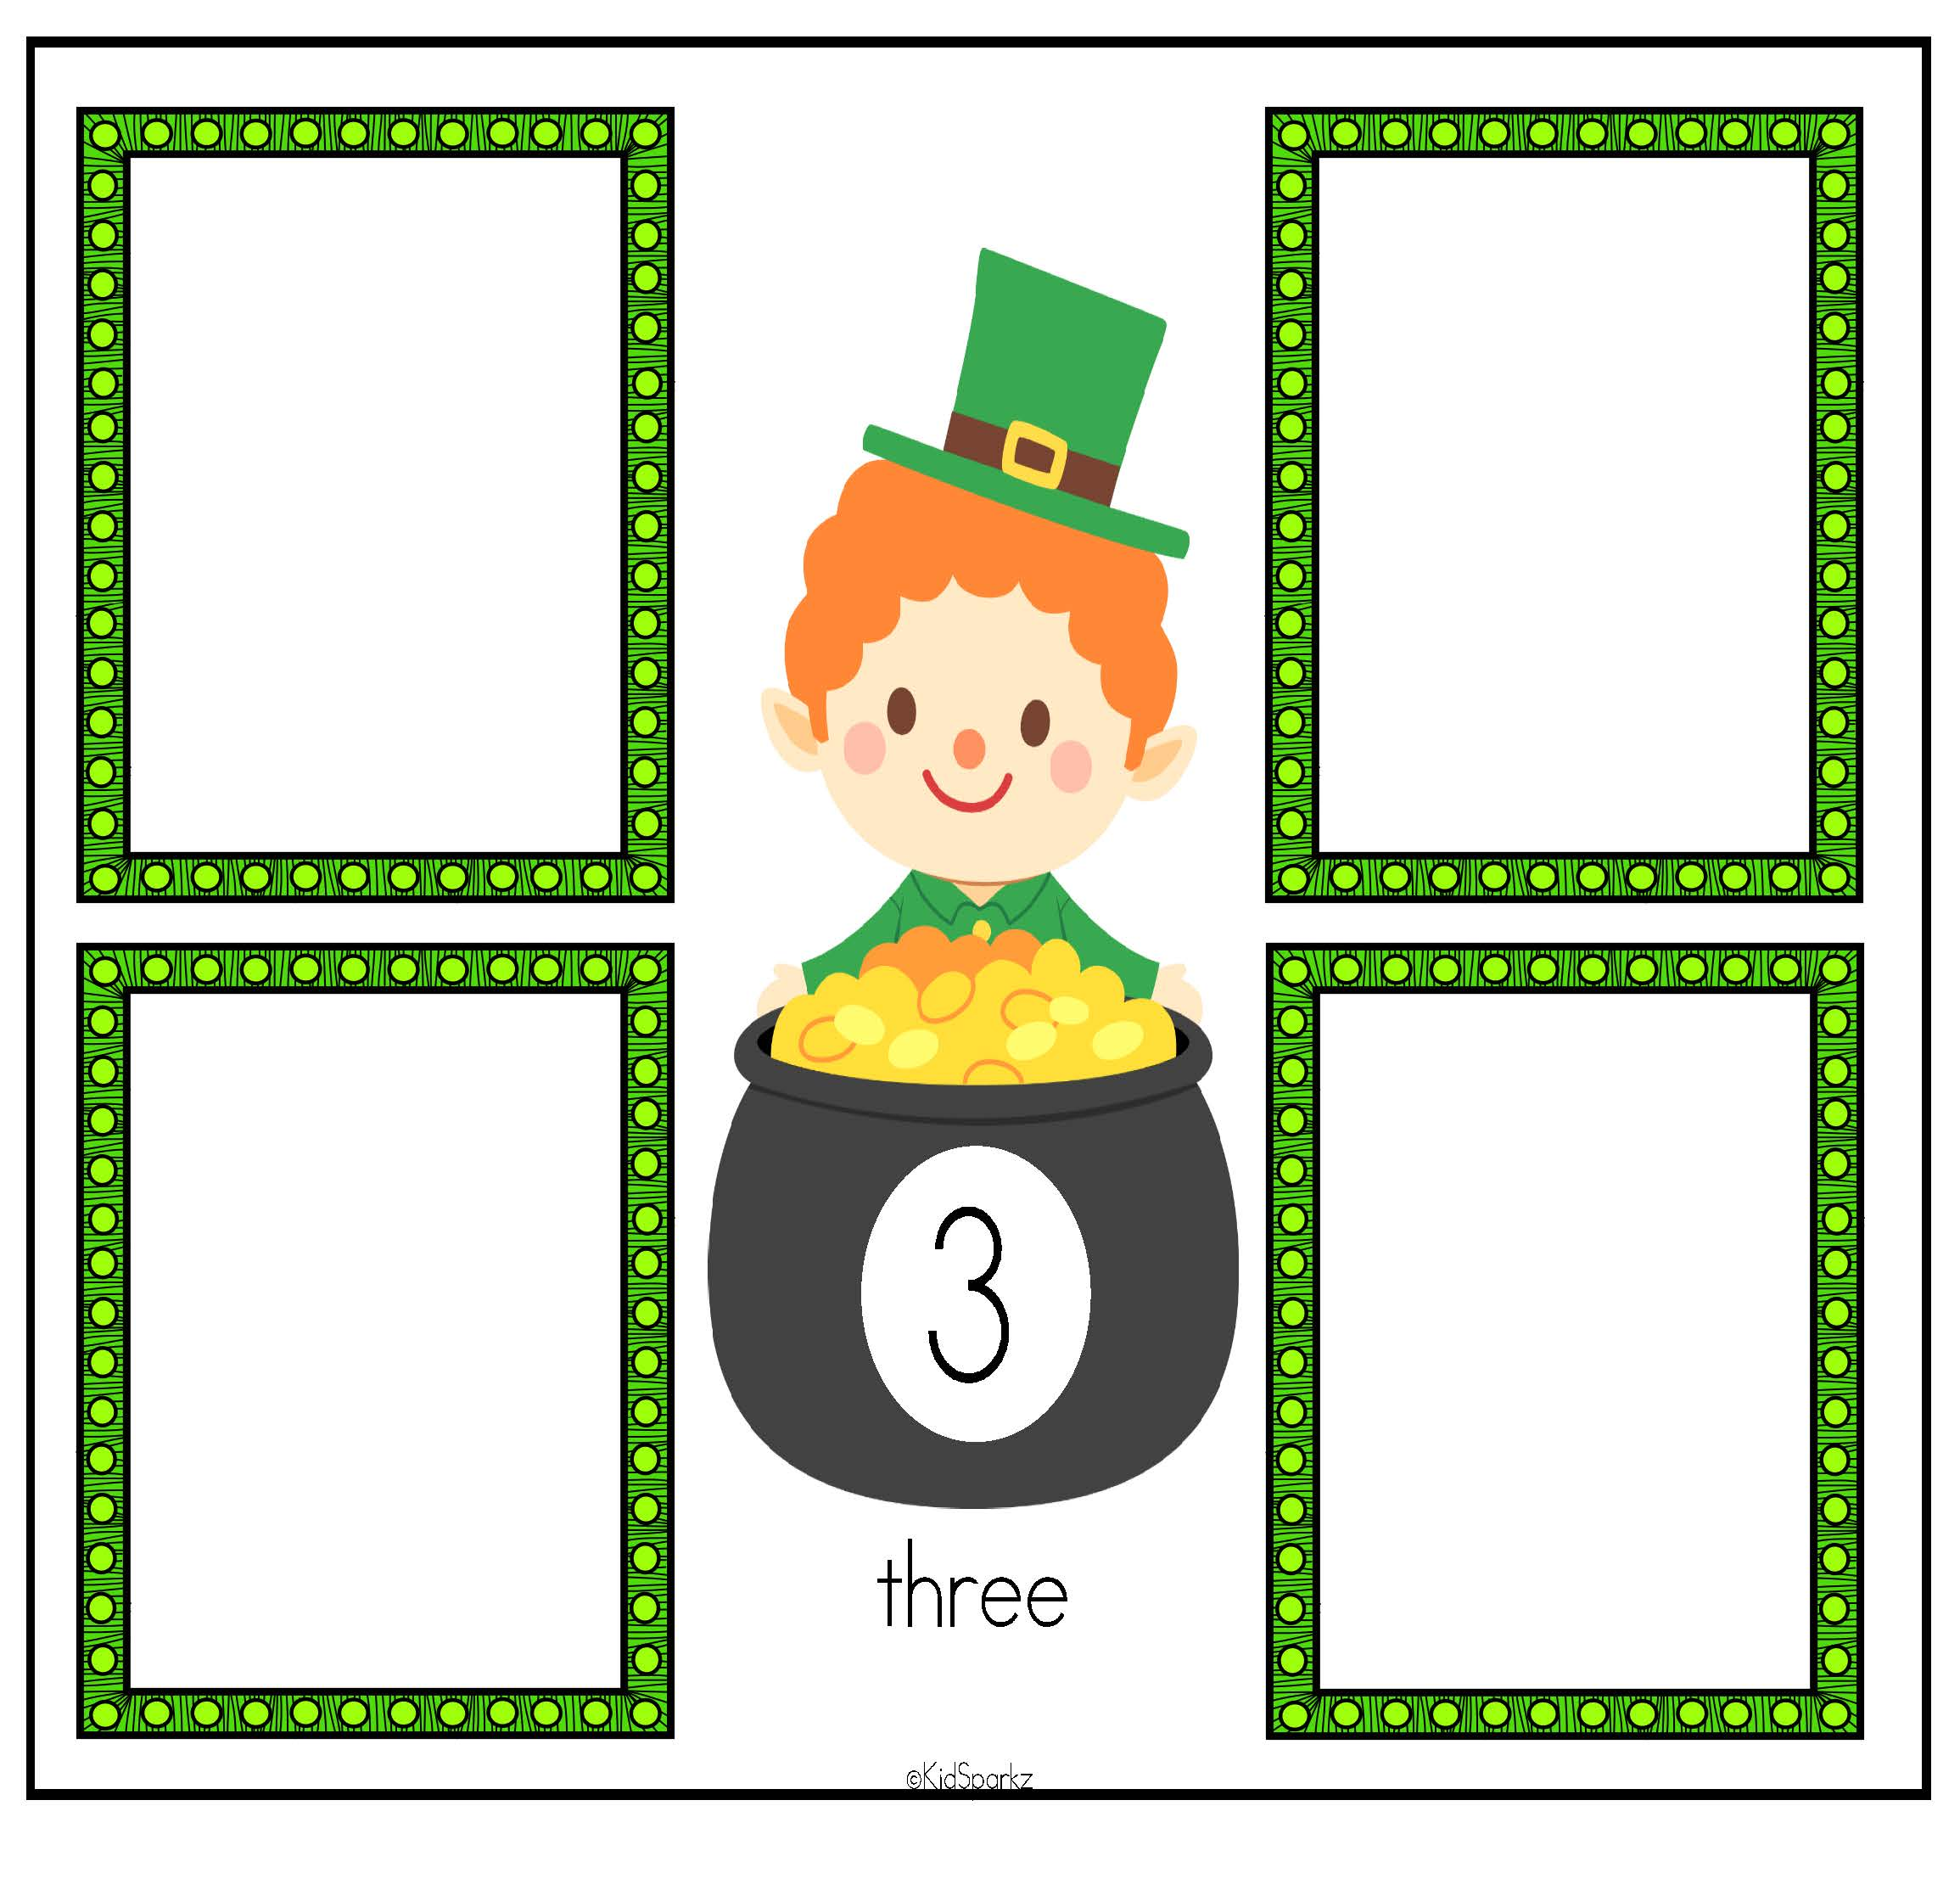 St Patrick S Day Leprechaun Number Mats Center 0 12 Preschool And Kindergarten